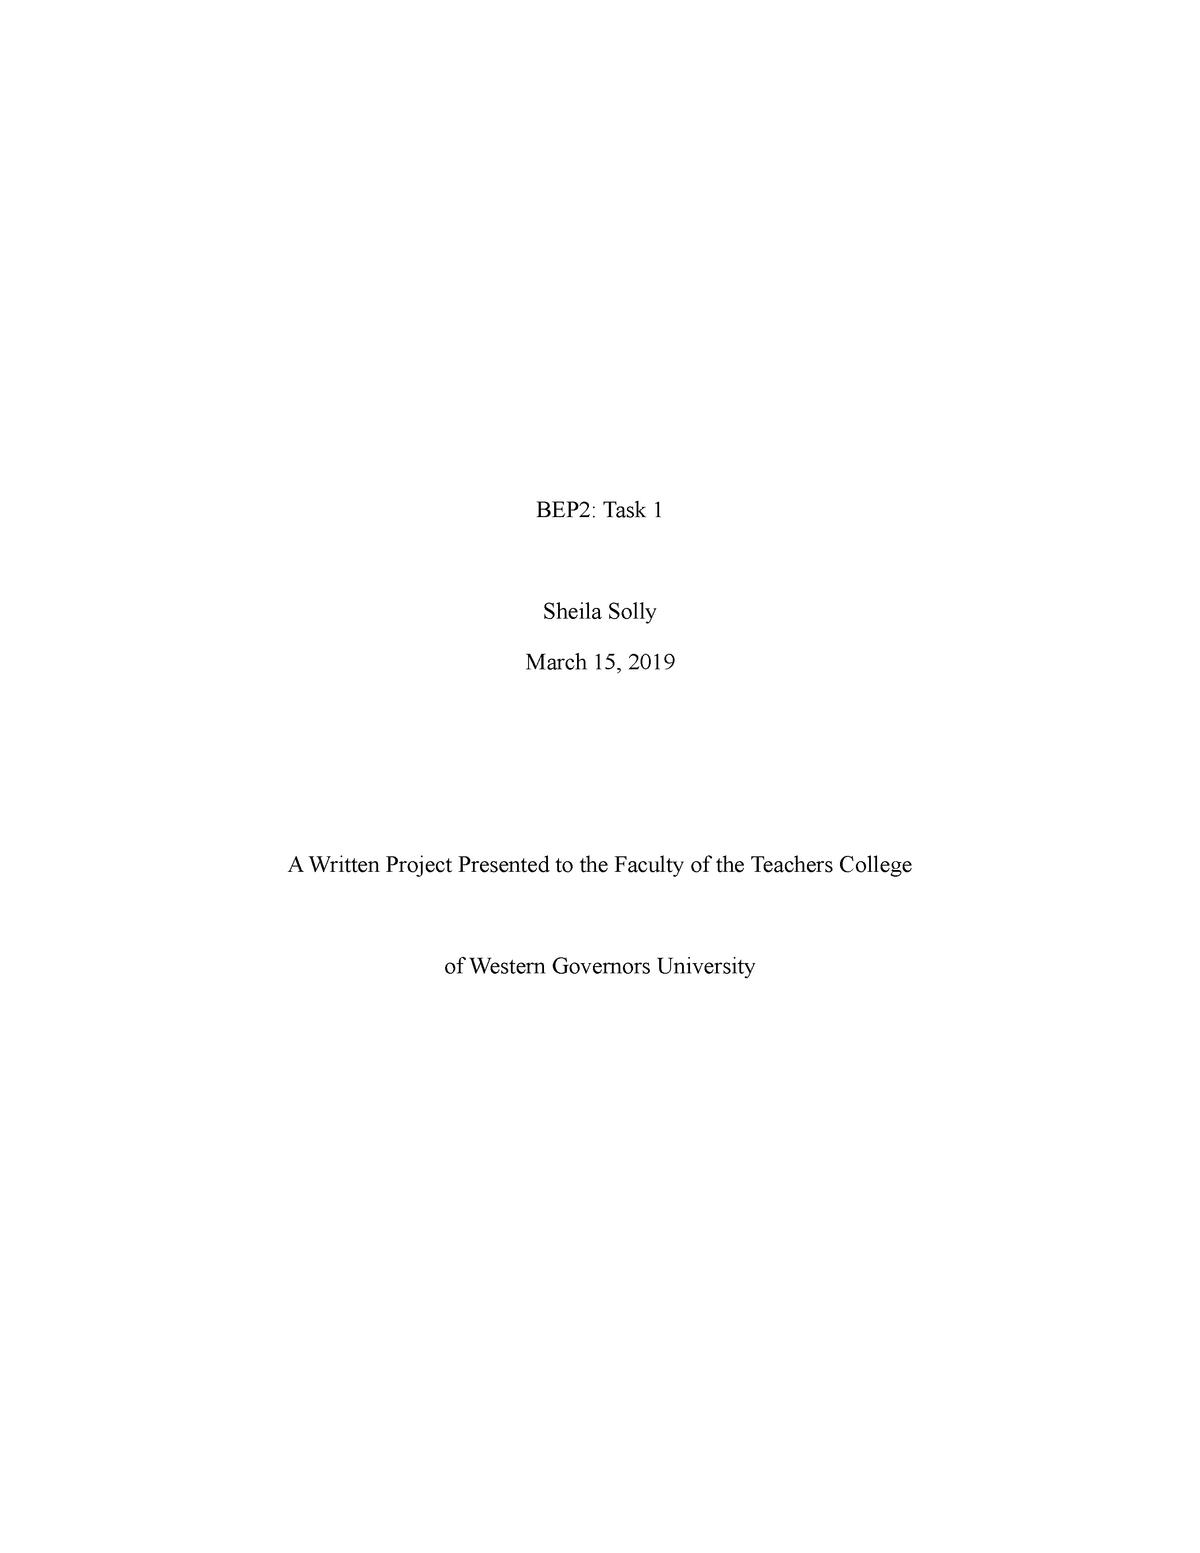 BEP2 Task 1 - Grade: pass - c225 - StuDocu